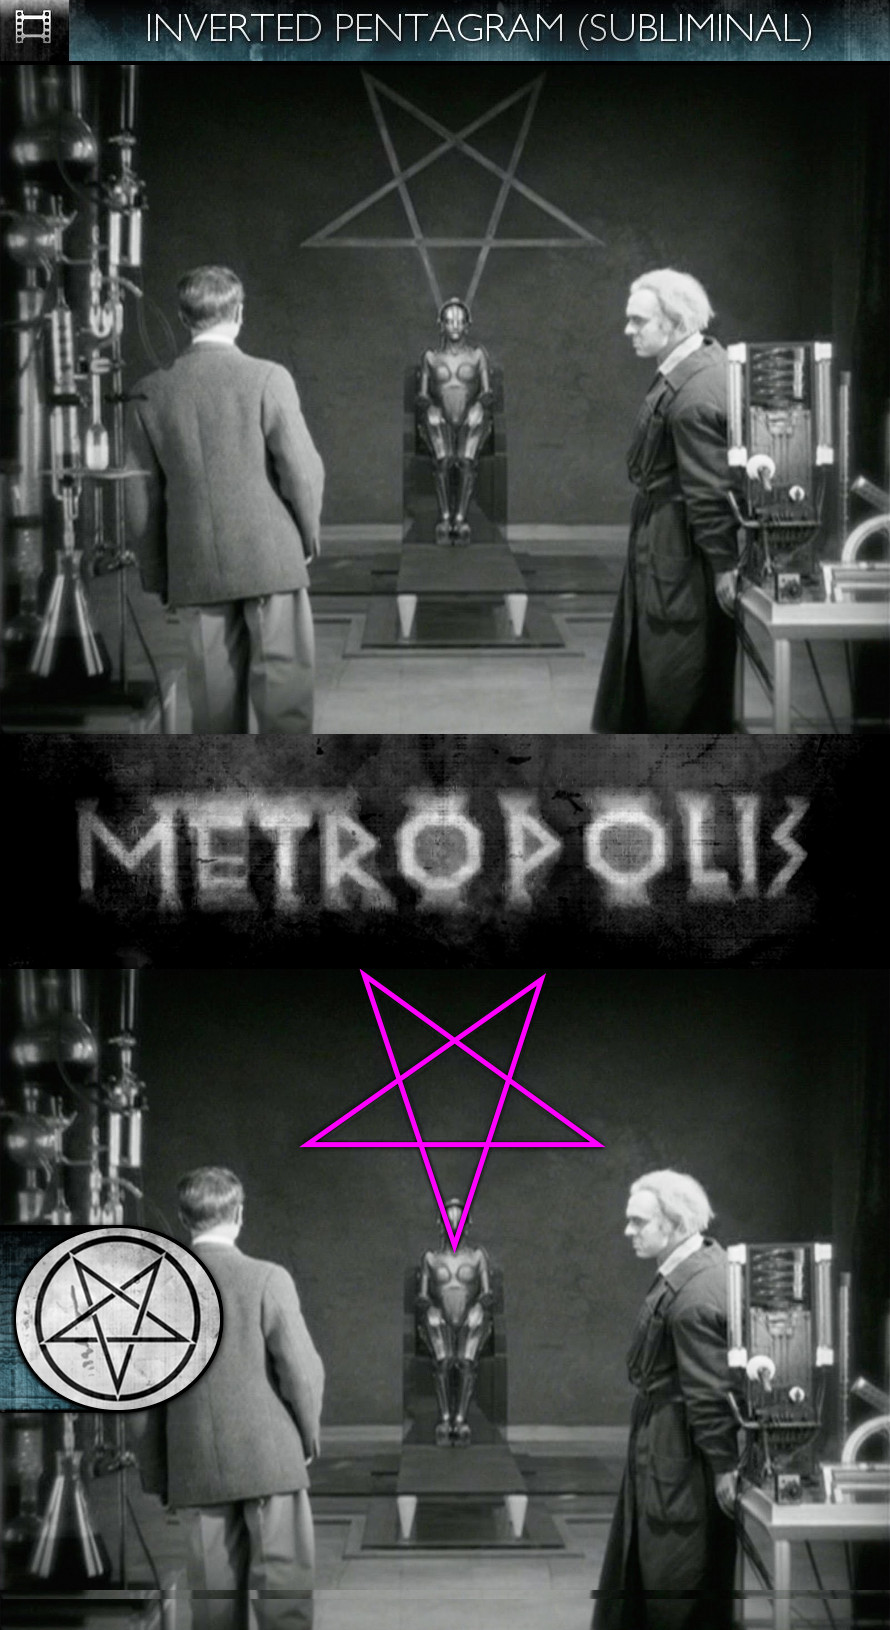 Metropolis (1927) - Inverted Pentagram - Subliminal